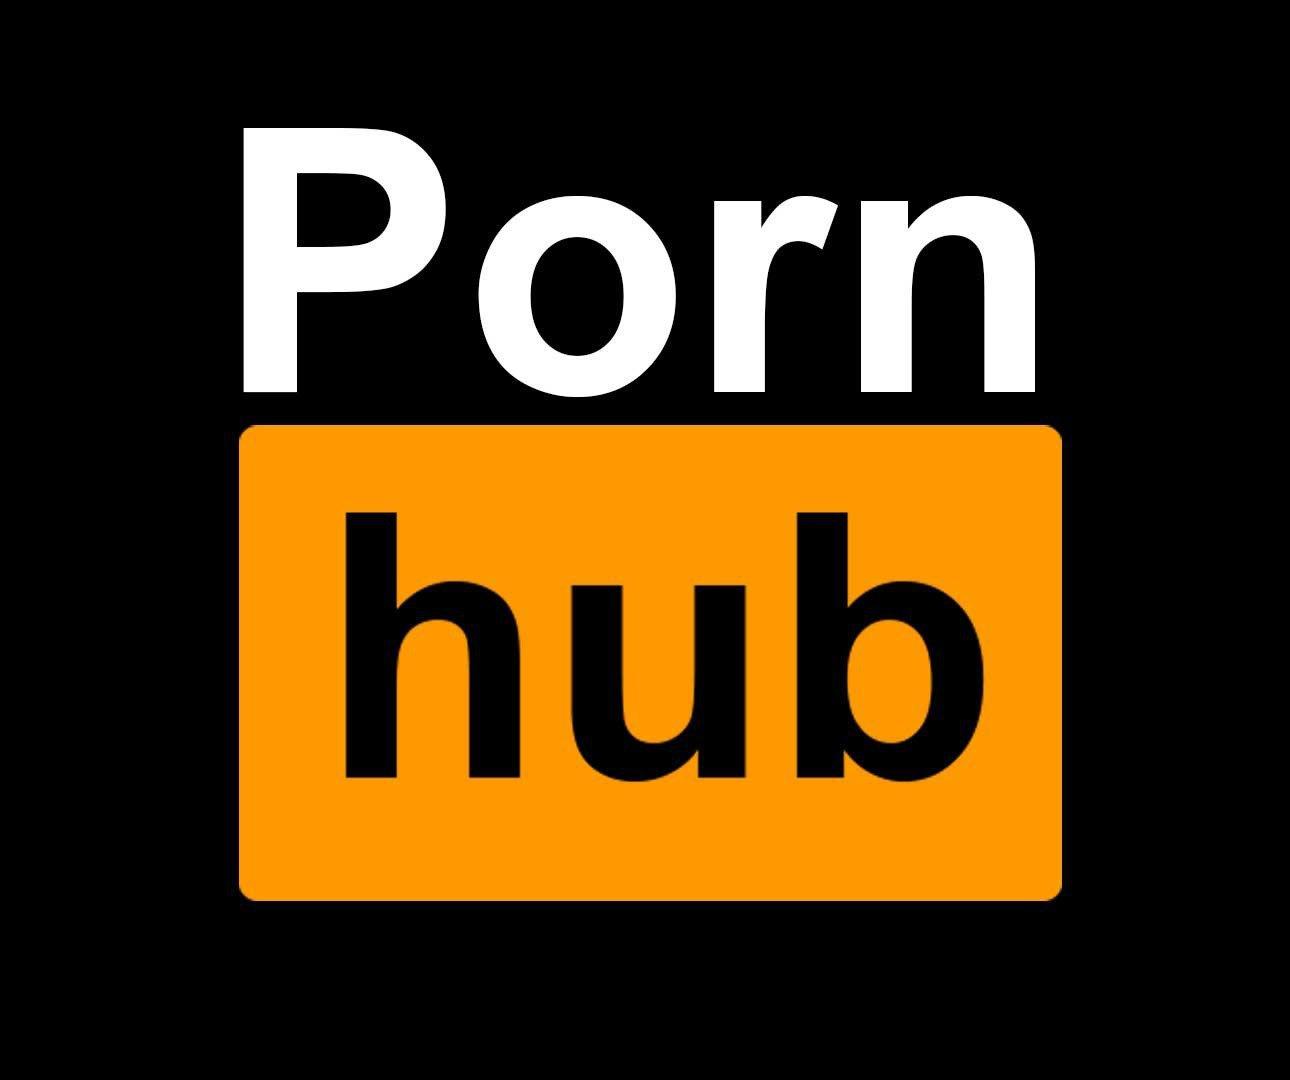 +pornhub